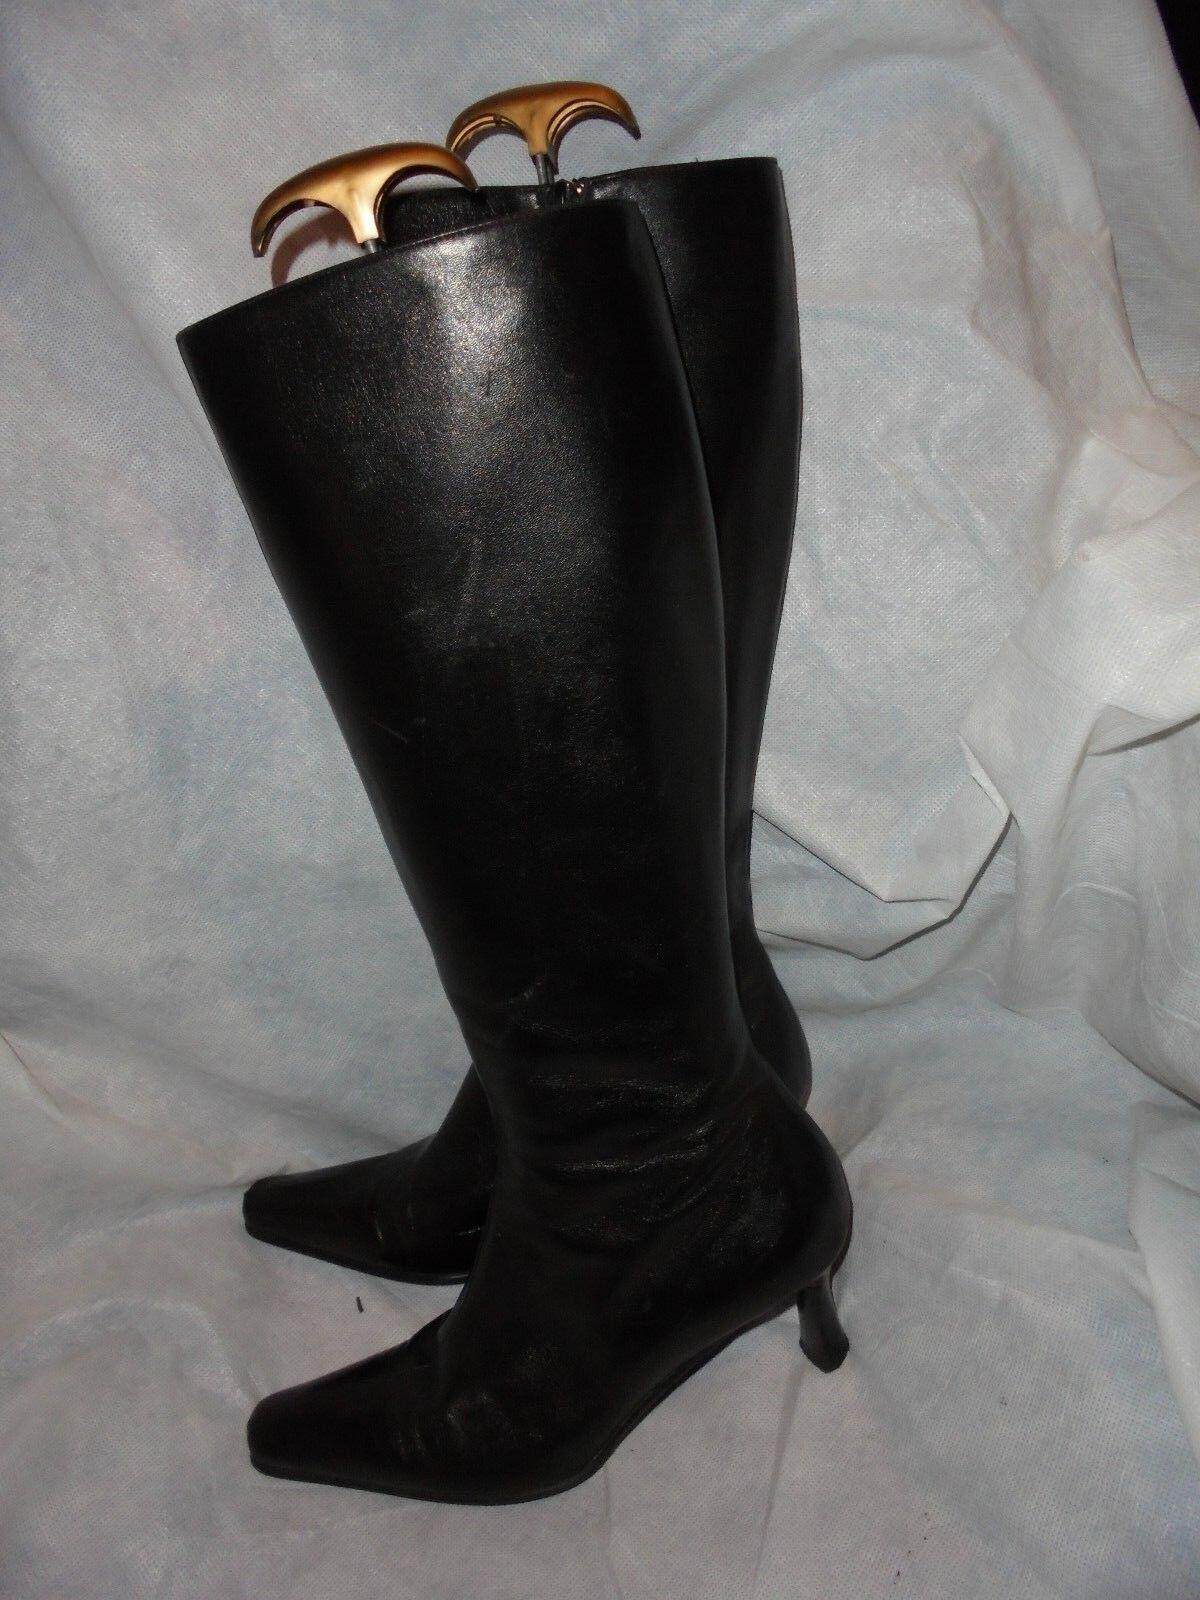 CAREL damen schwarz LEATHER ZIP KNEE KNEE KNEE HIGH Stiefel  Größe UK 6 EU 39  VCG 6f42aa